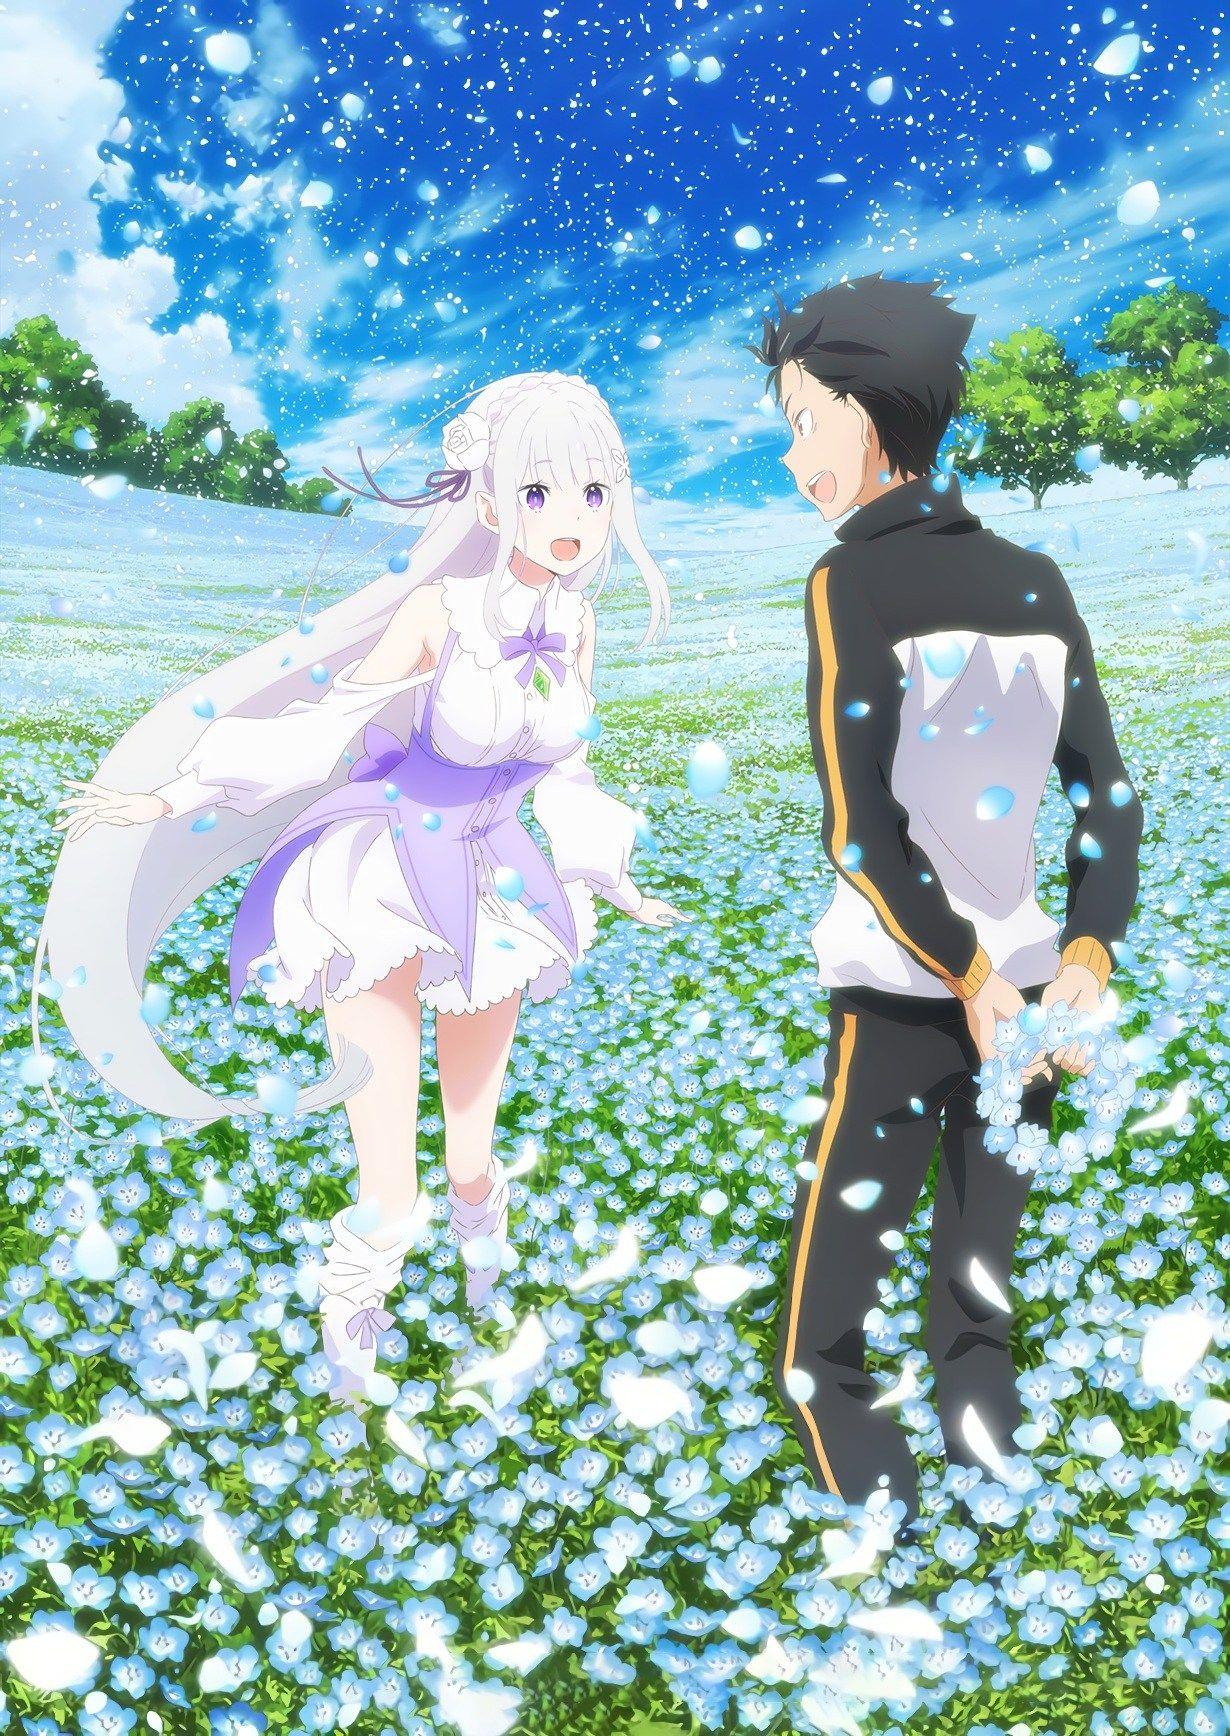 ReZero Ova Visual rezero animegirl anime manga